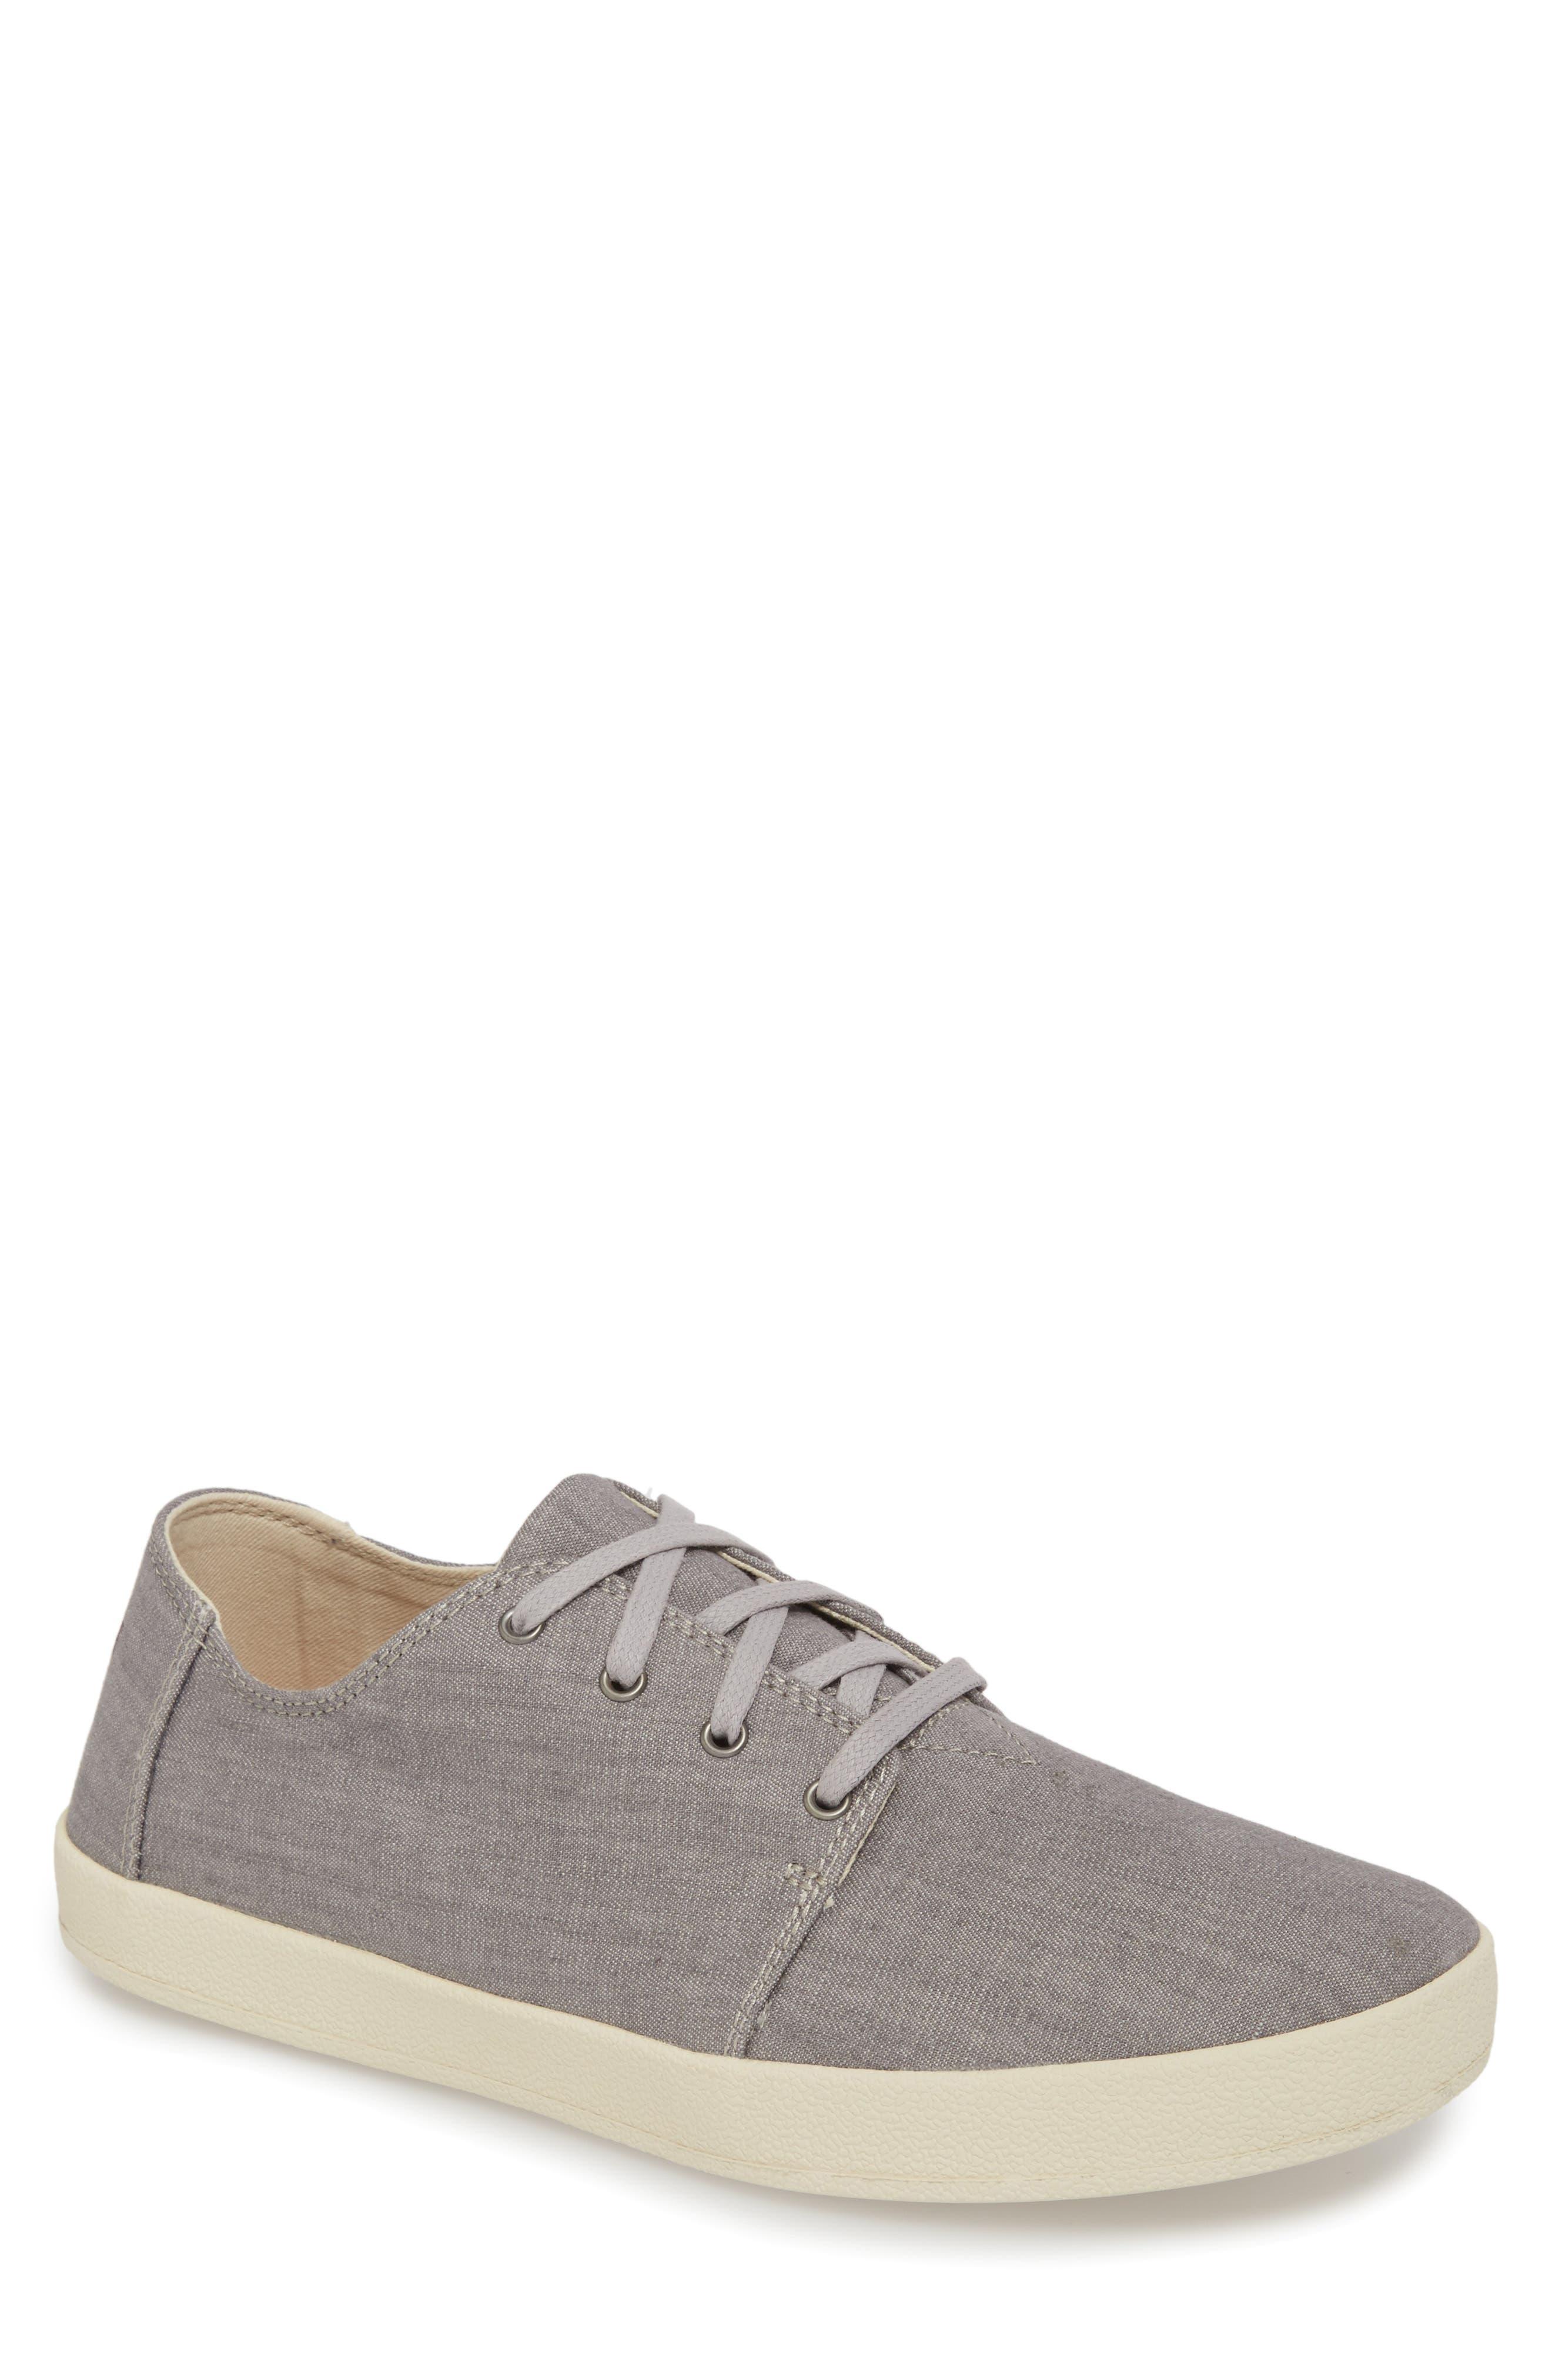 TOMS Payton Low-Top Sneakers in Grey Denim